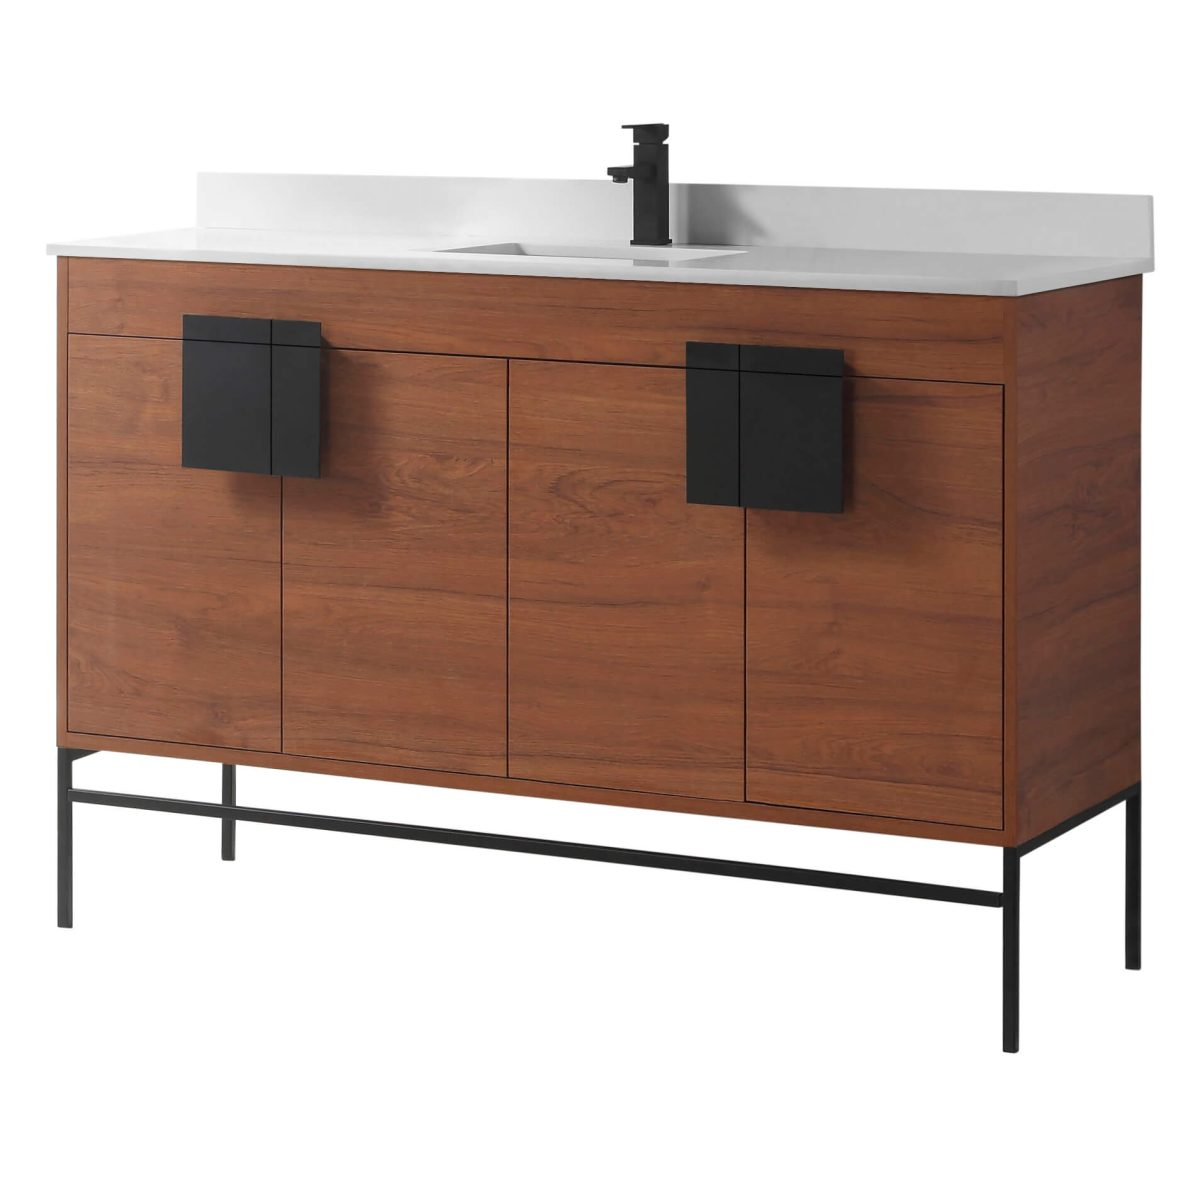 "Shawbridge 60"" Modern Single Bathroom Vanity  Spicy Walnut with Black Hardware"